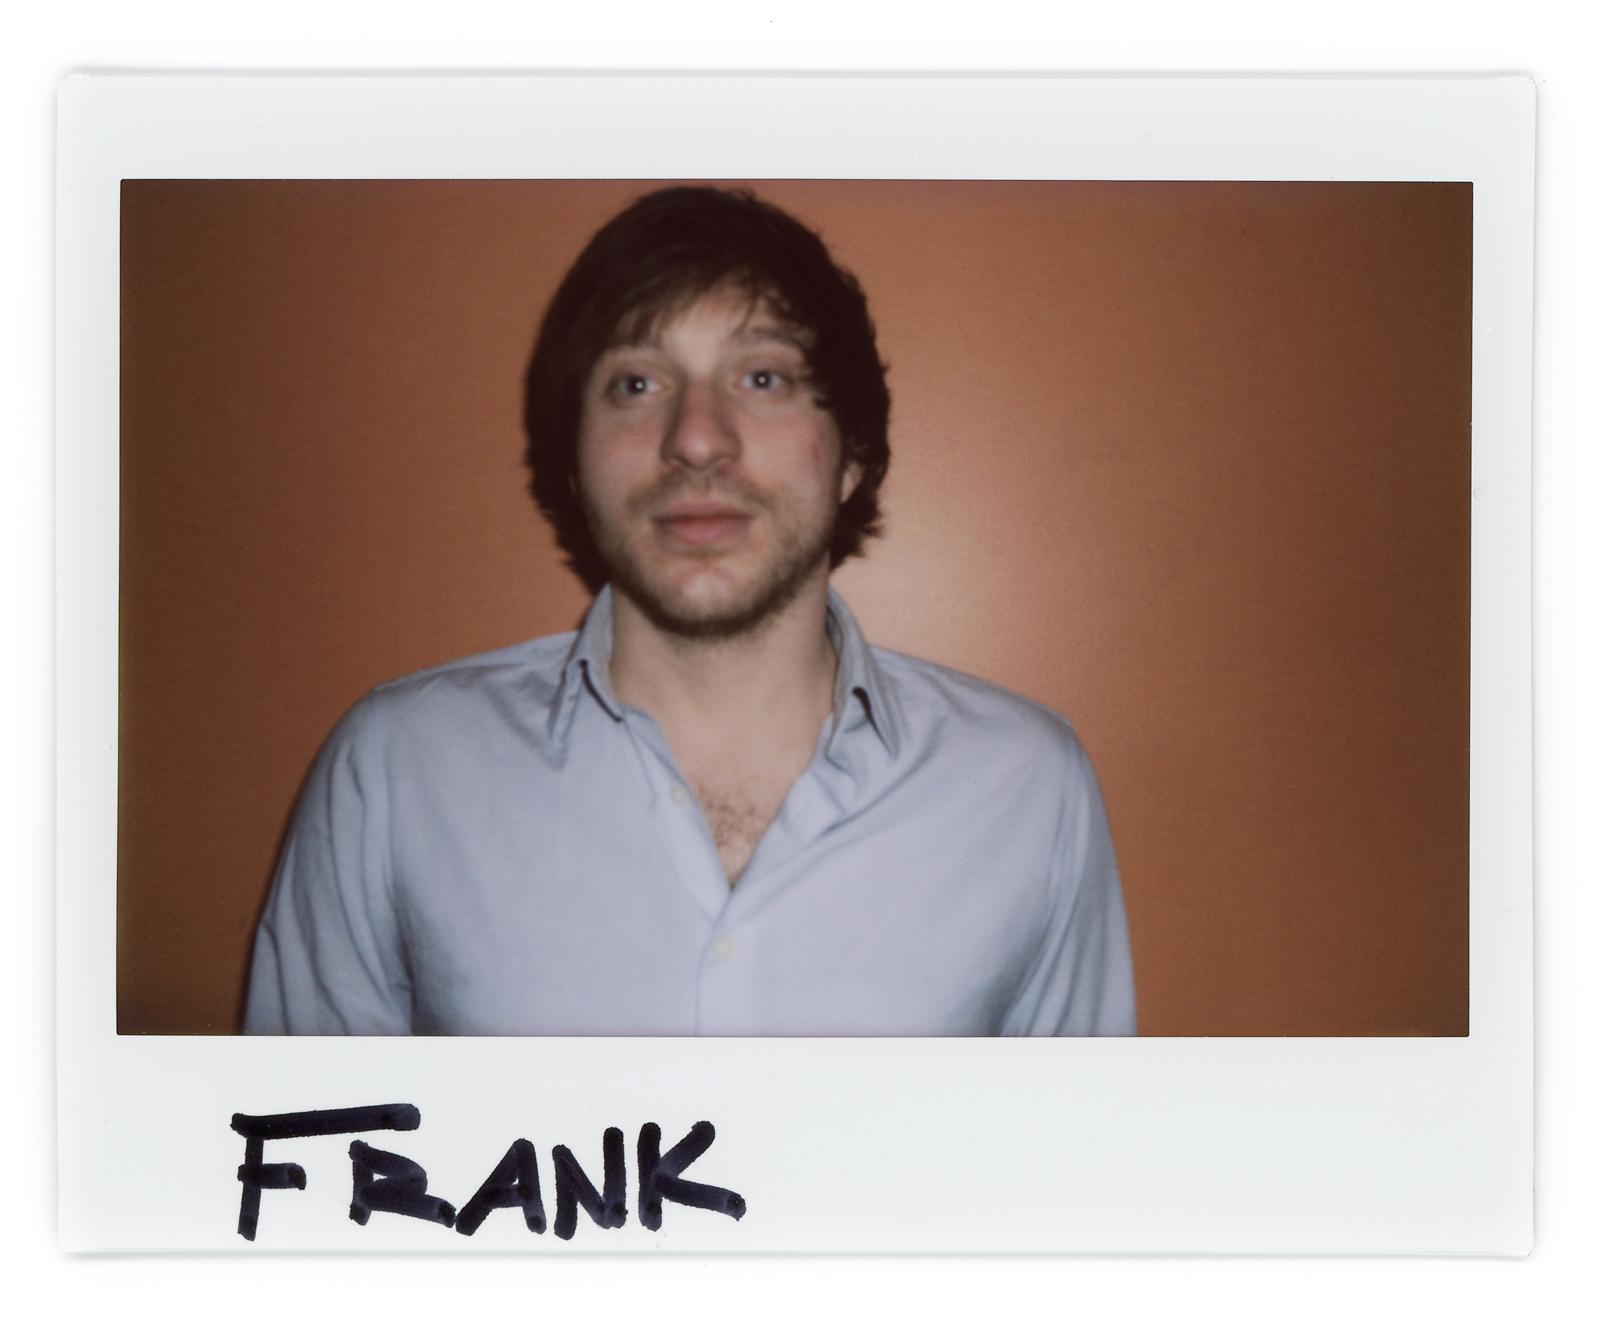 Frank_S.jpg